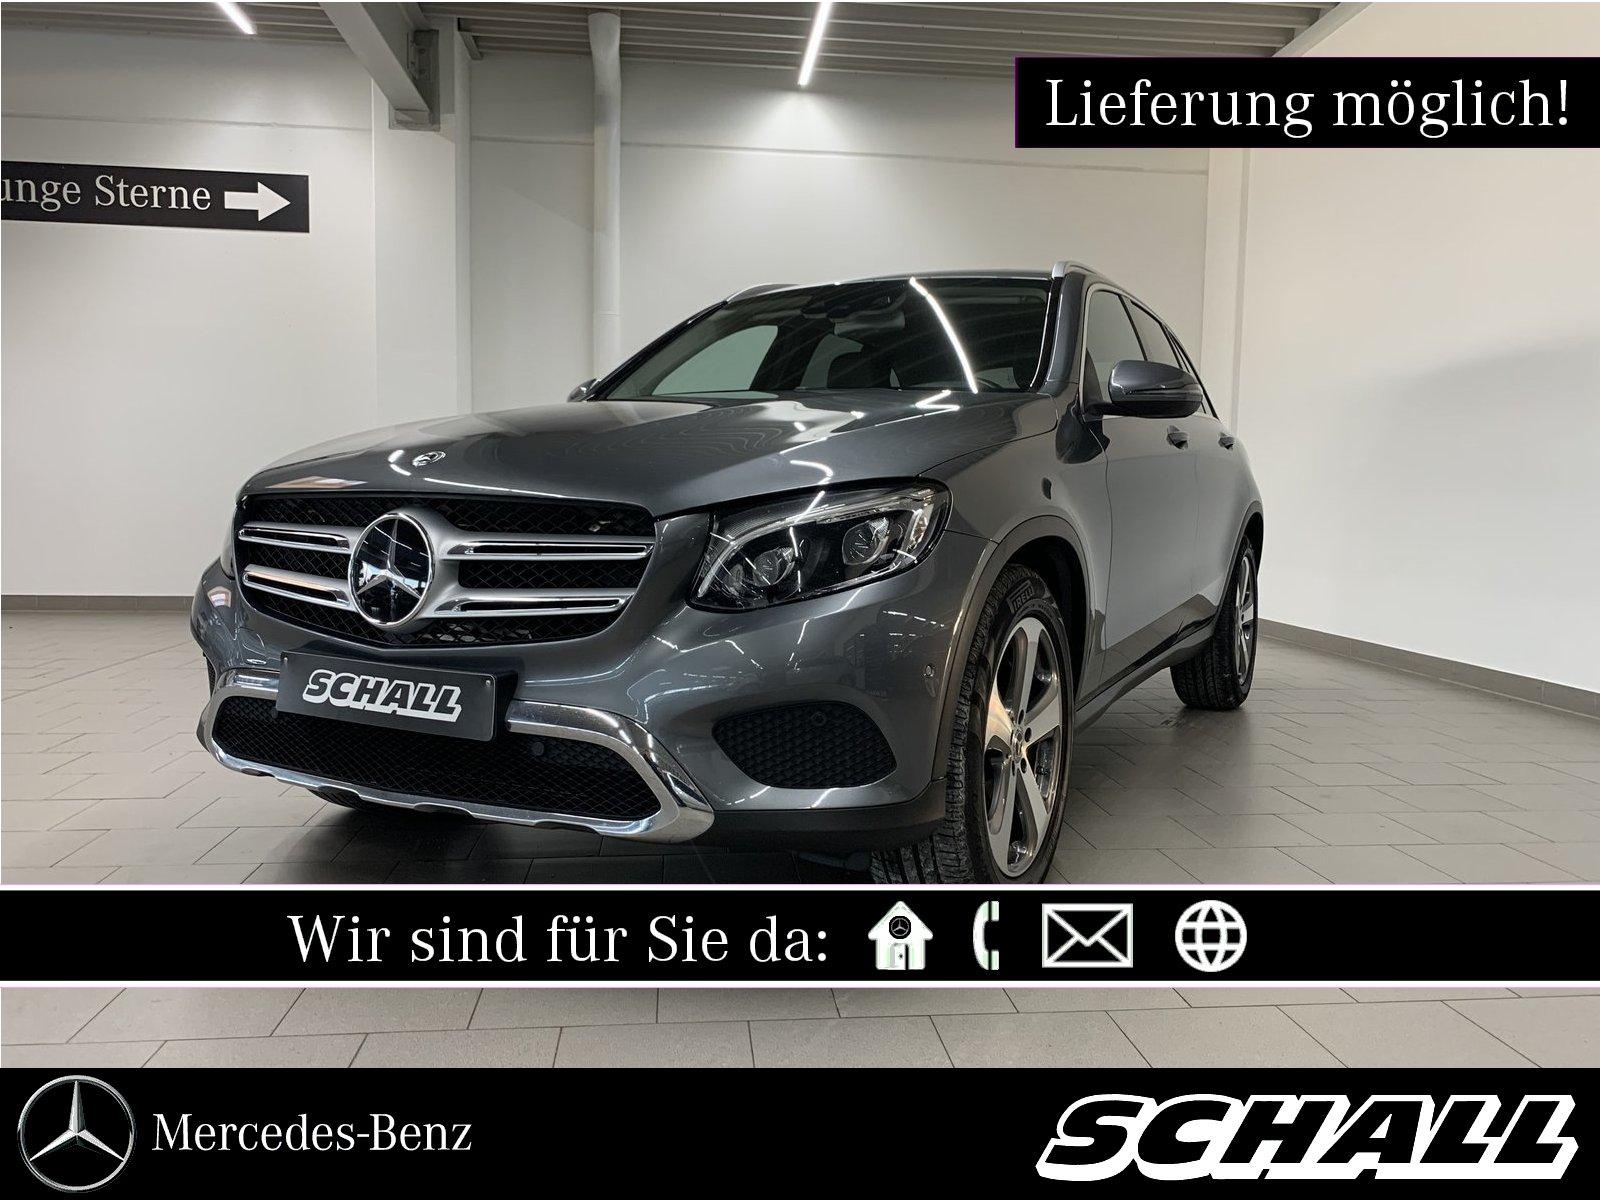 Mercedes-Benz GLC 350 d 4M AMG INT+AHK+DISTR+LED+COMAND+KAMERA, Jahr 2017, Diesel